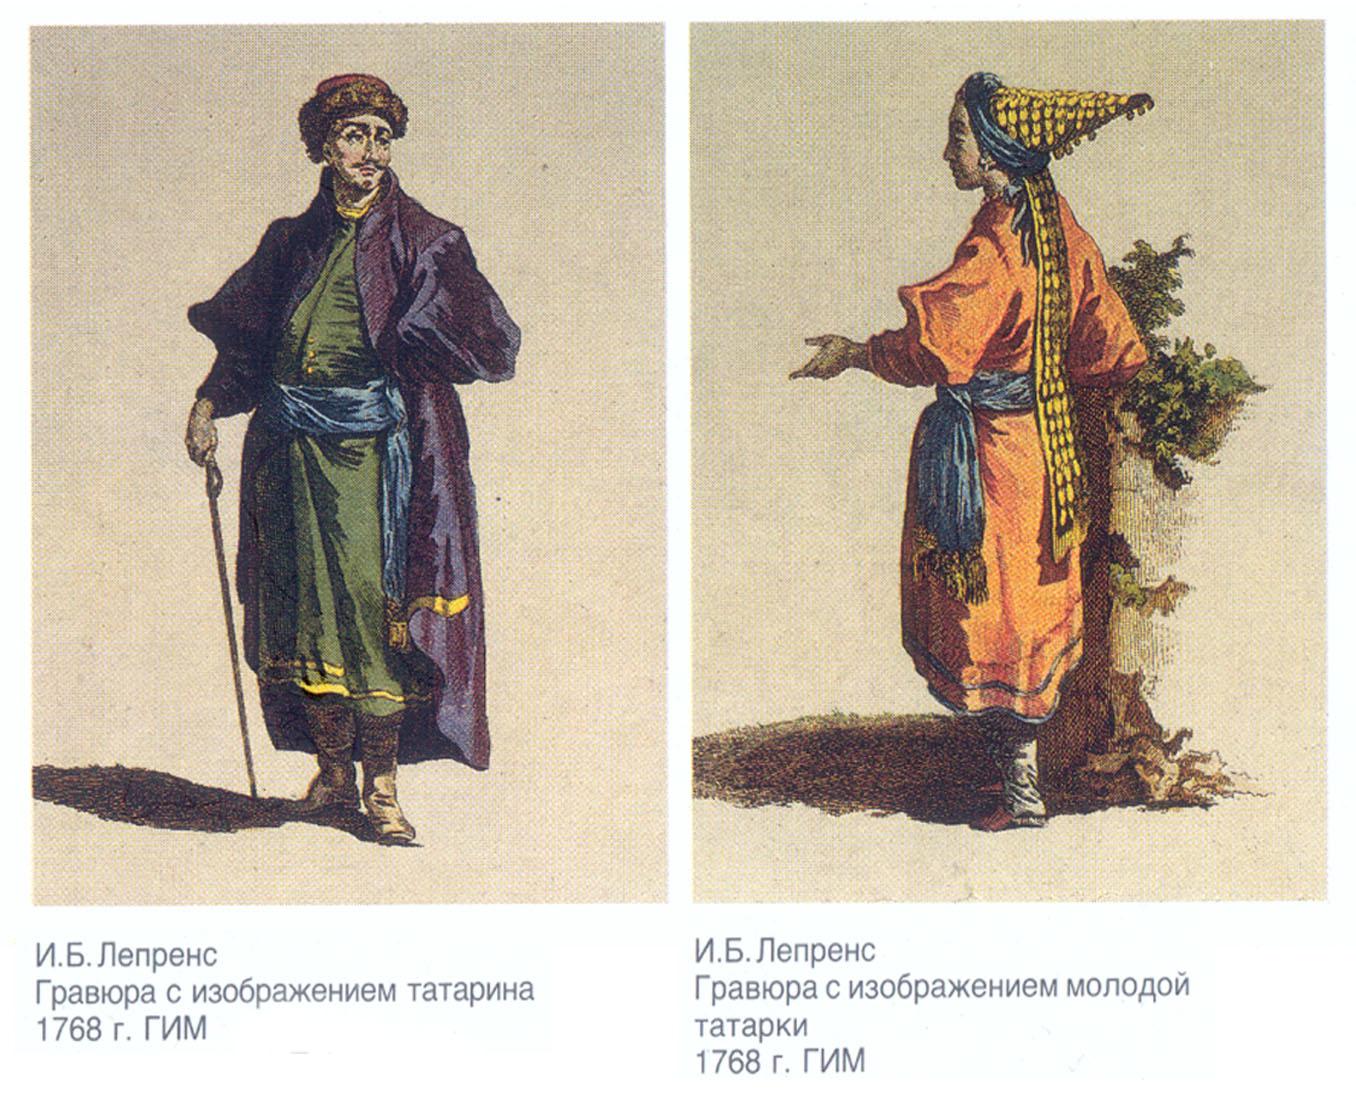 казанские татары 4.jpg